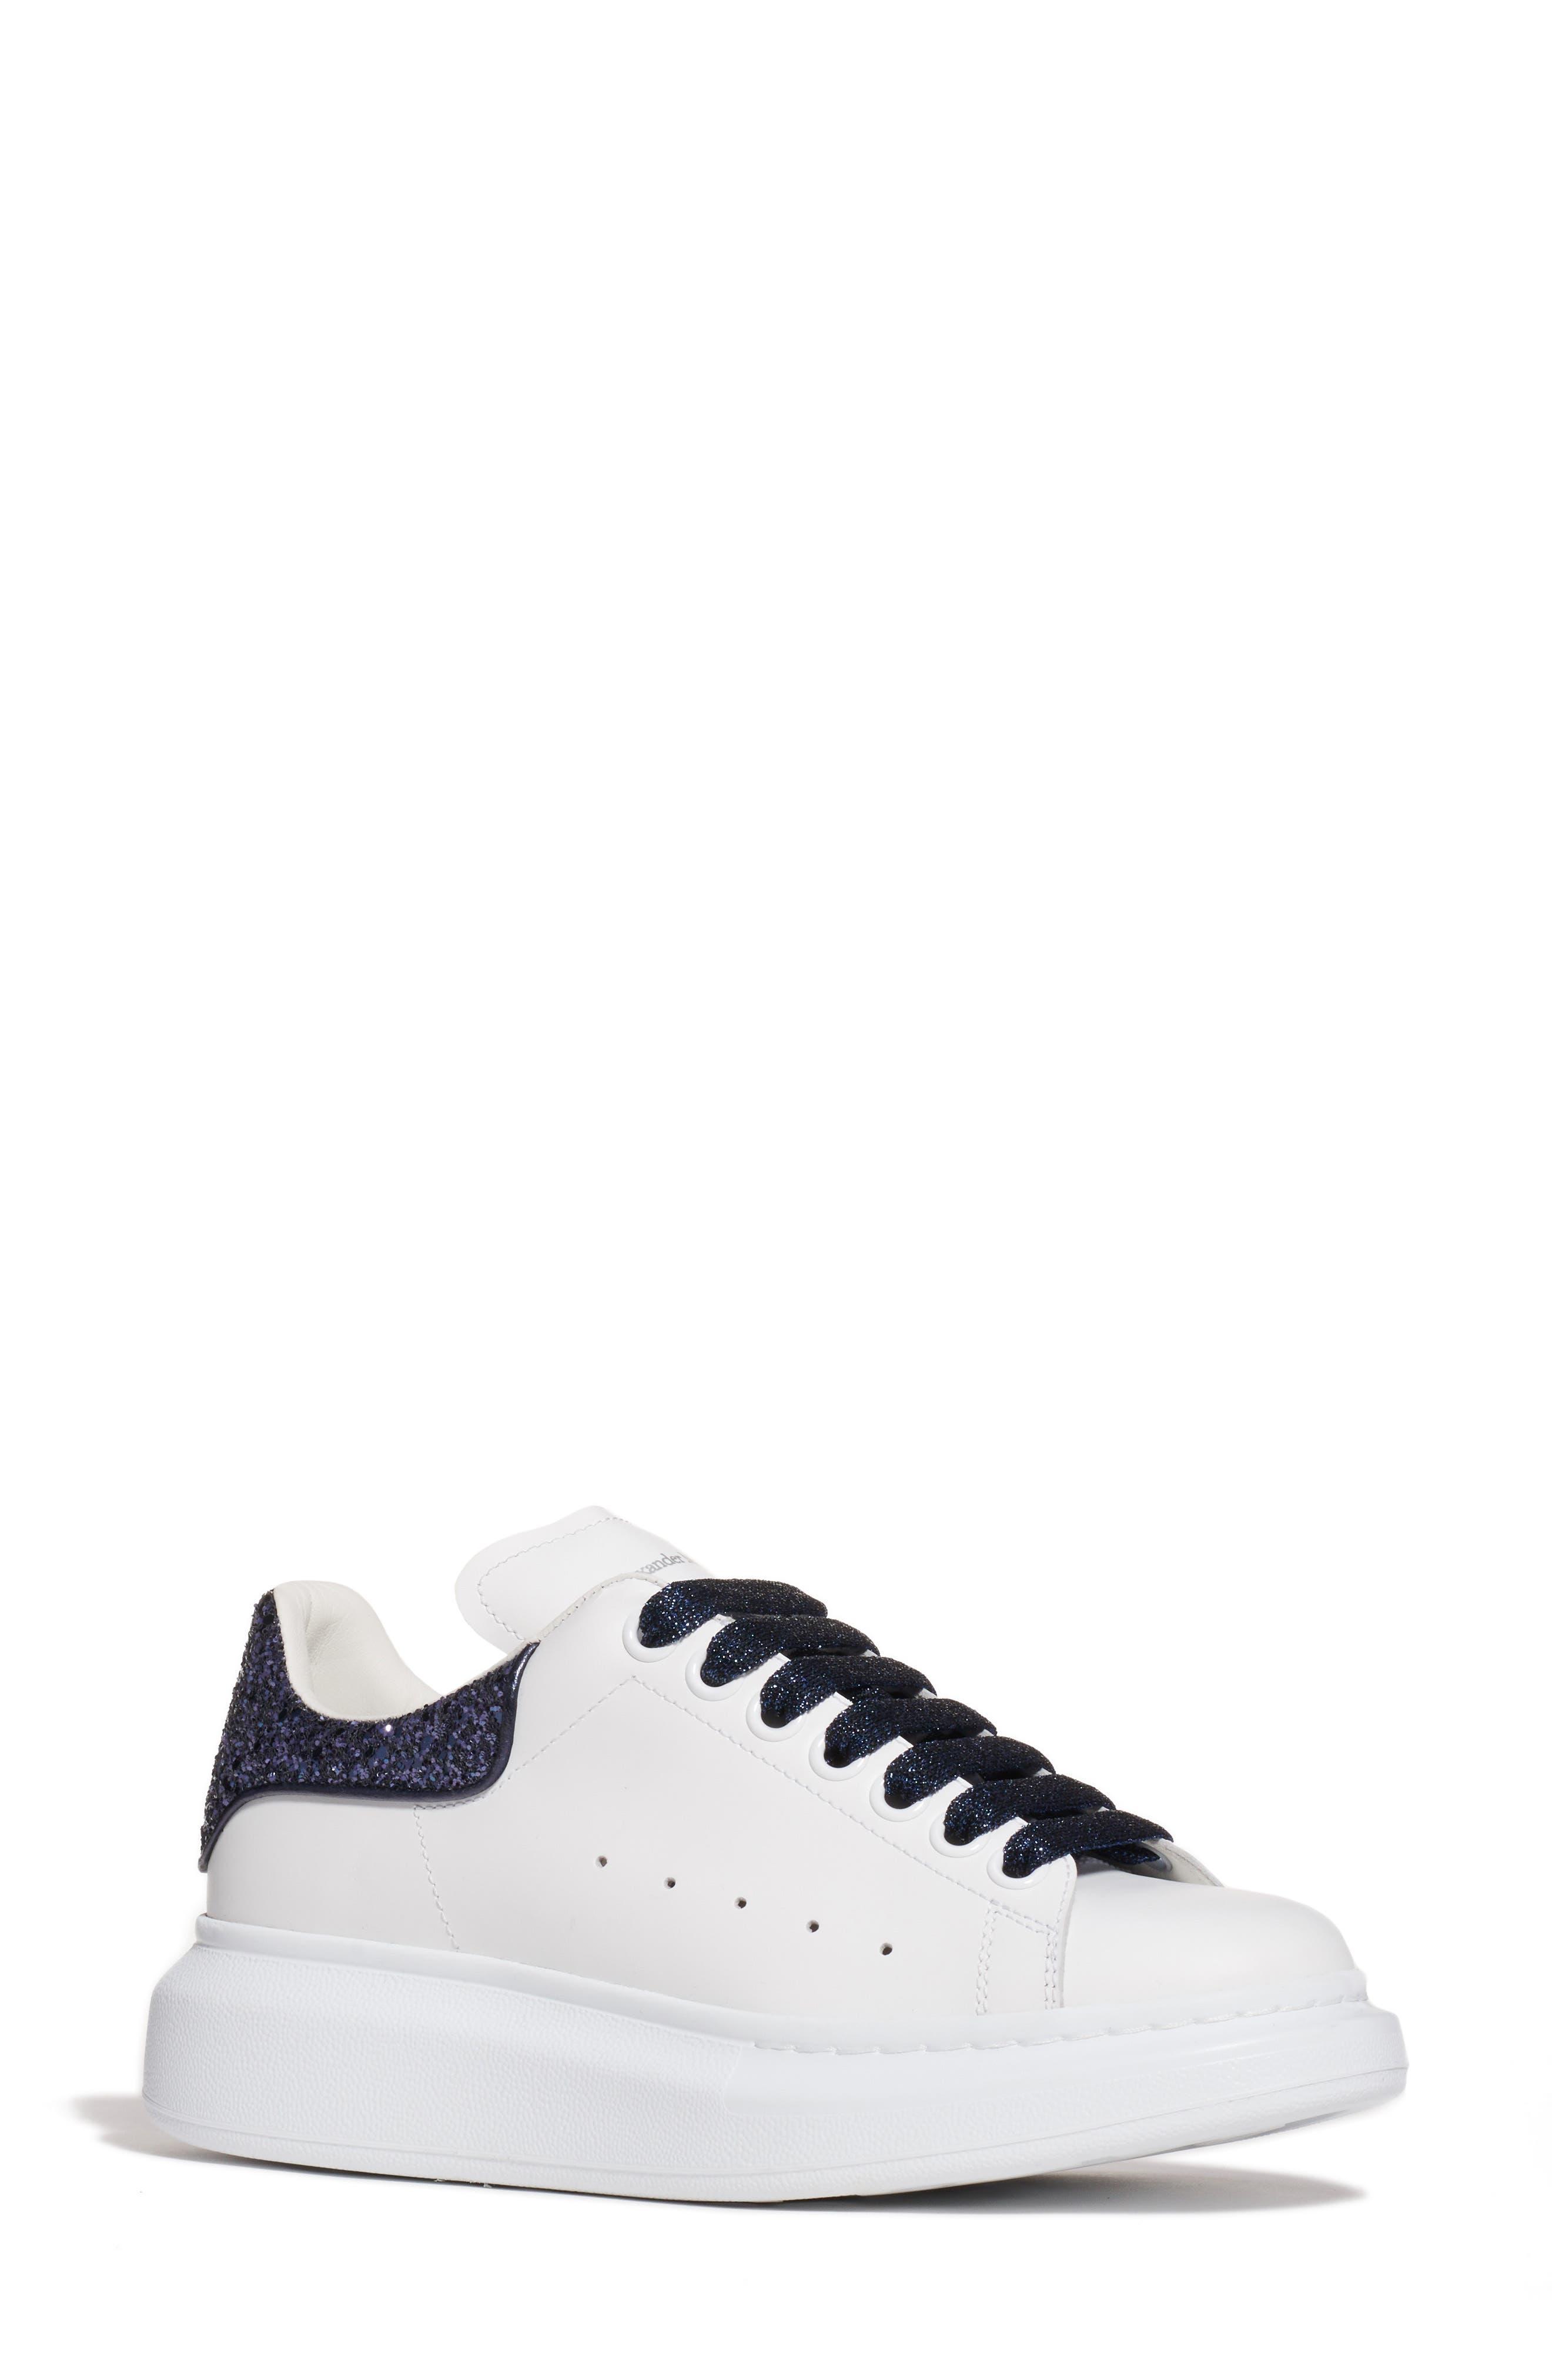 Alexander Mcqueen Sneaker - White